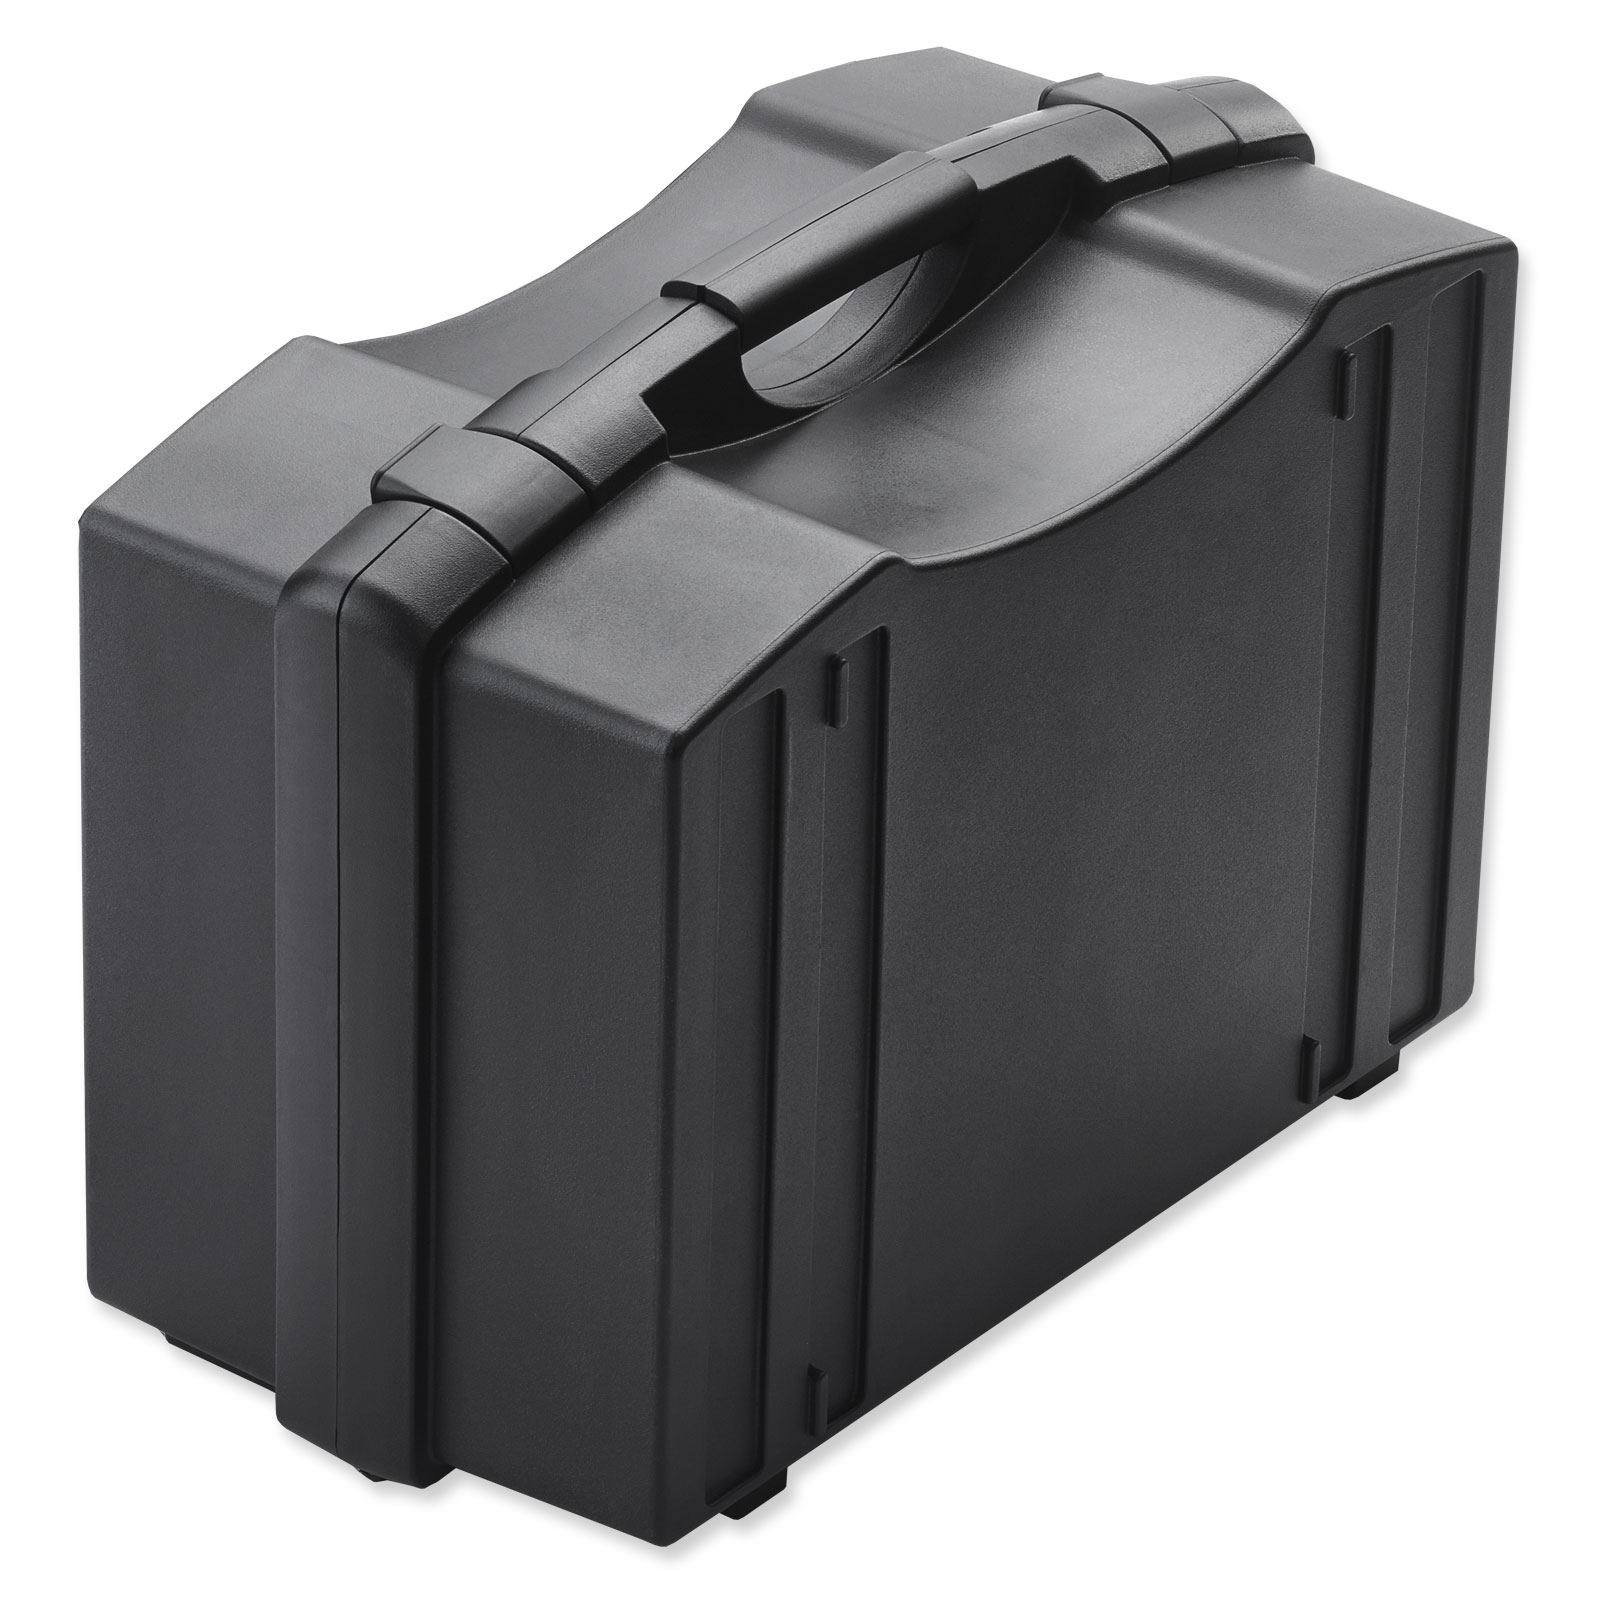 bwh Koffer Protector Case Werkzeugkoffer groß 70300